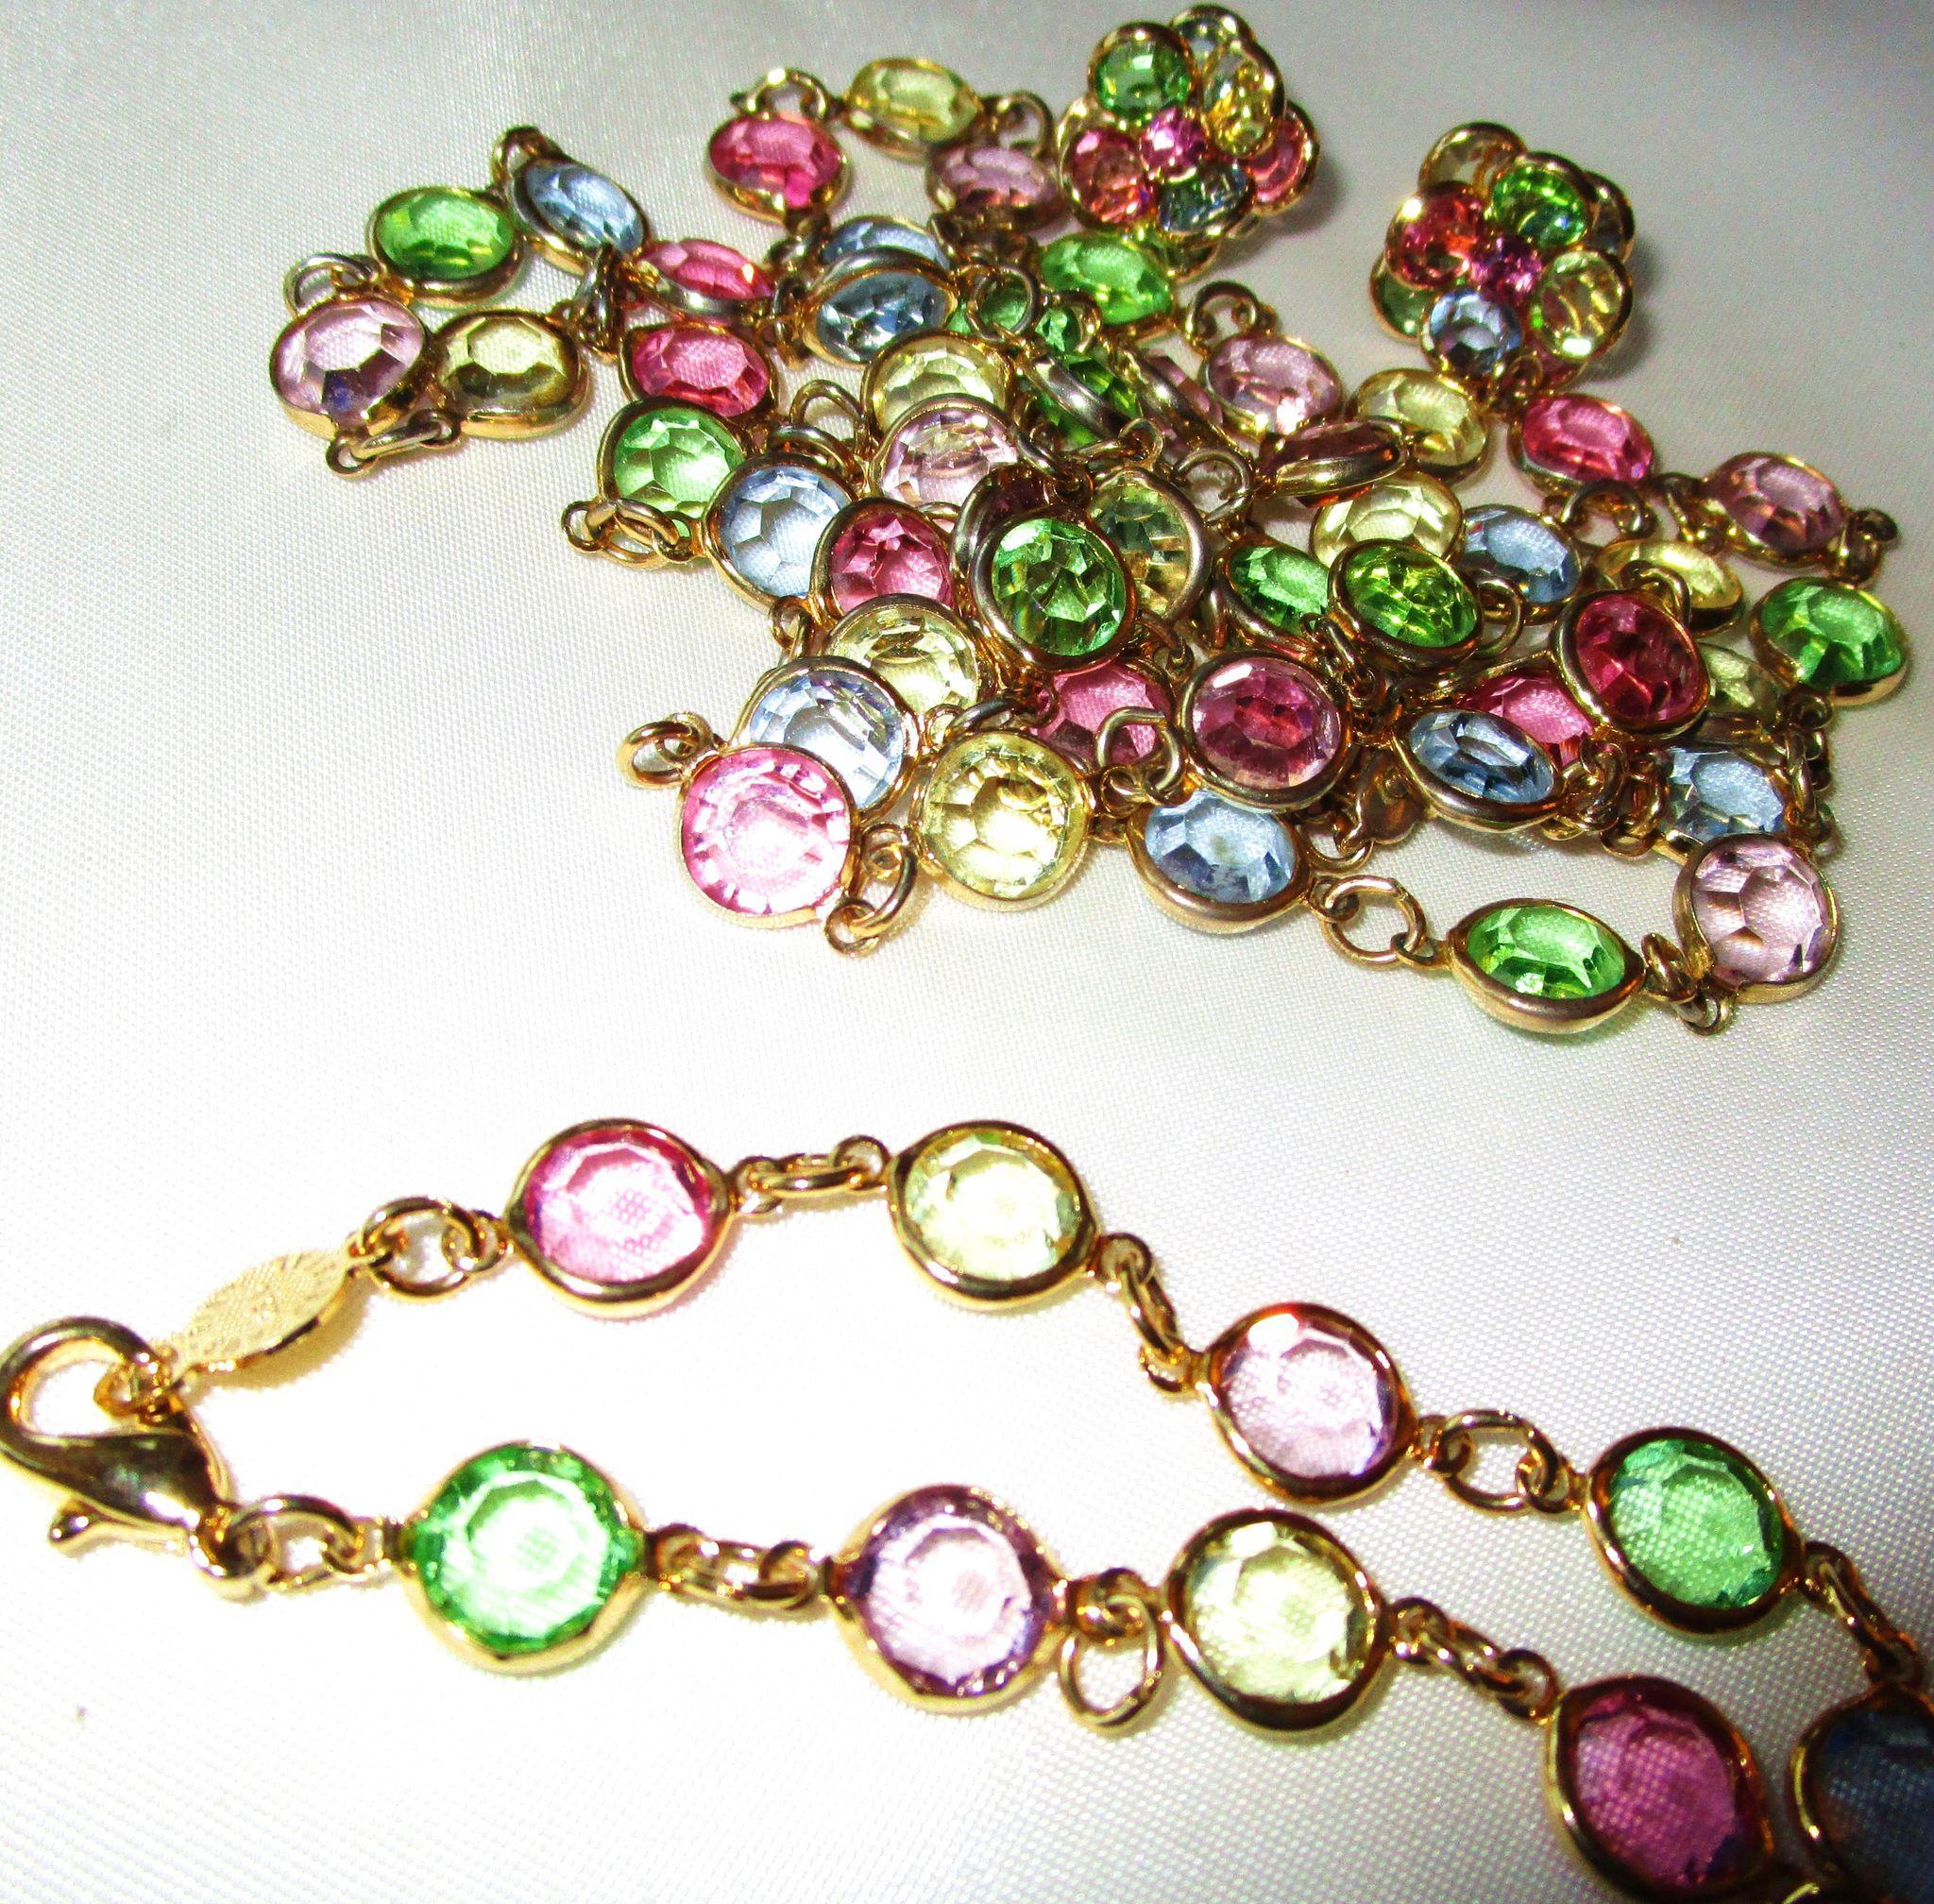 Vintage Swarovski Pastel Bezel Set Crystal Necklace ...